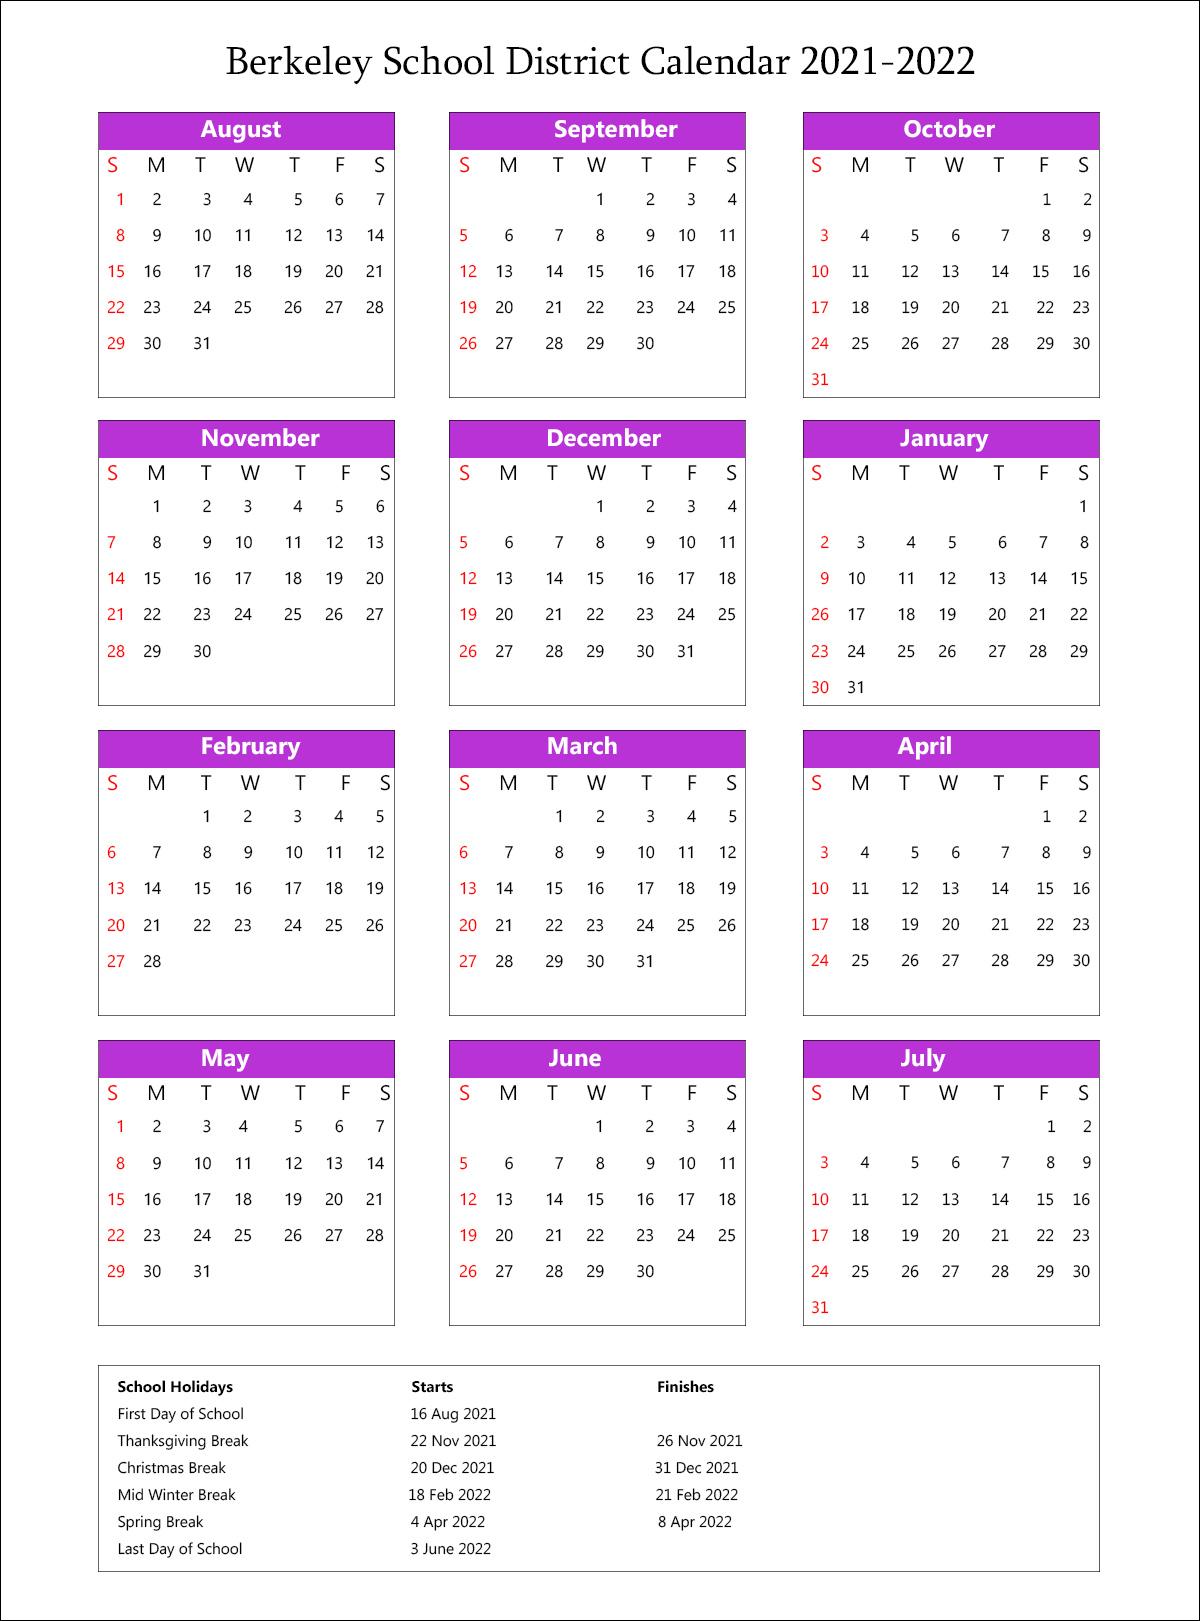 Berkeley Unified School District, California Calendar Holidays 2021